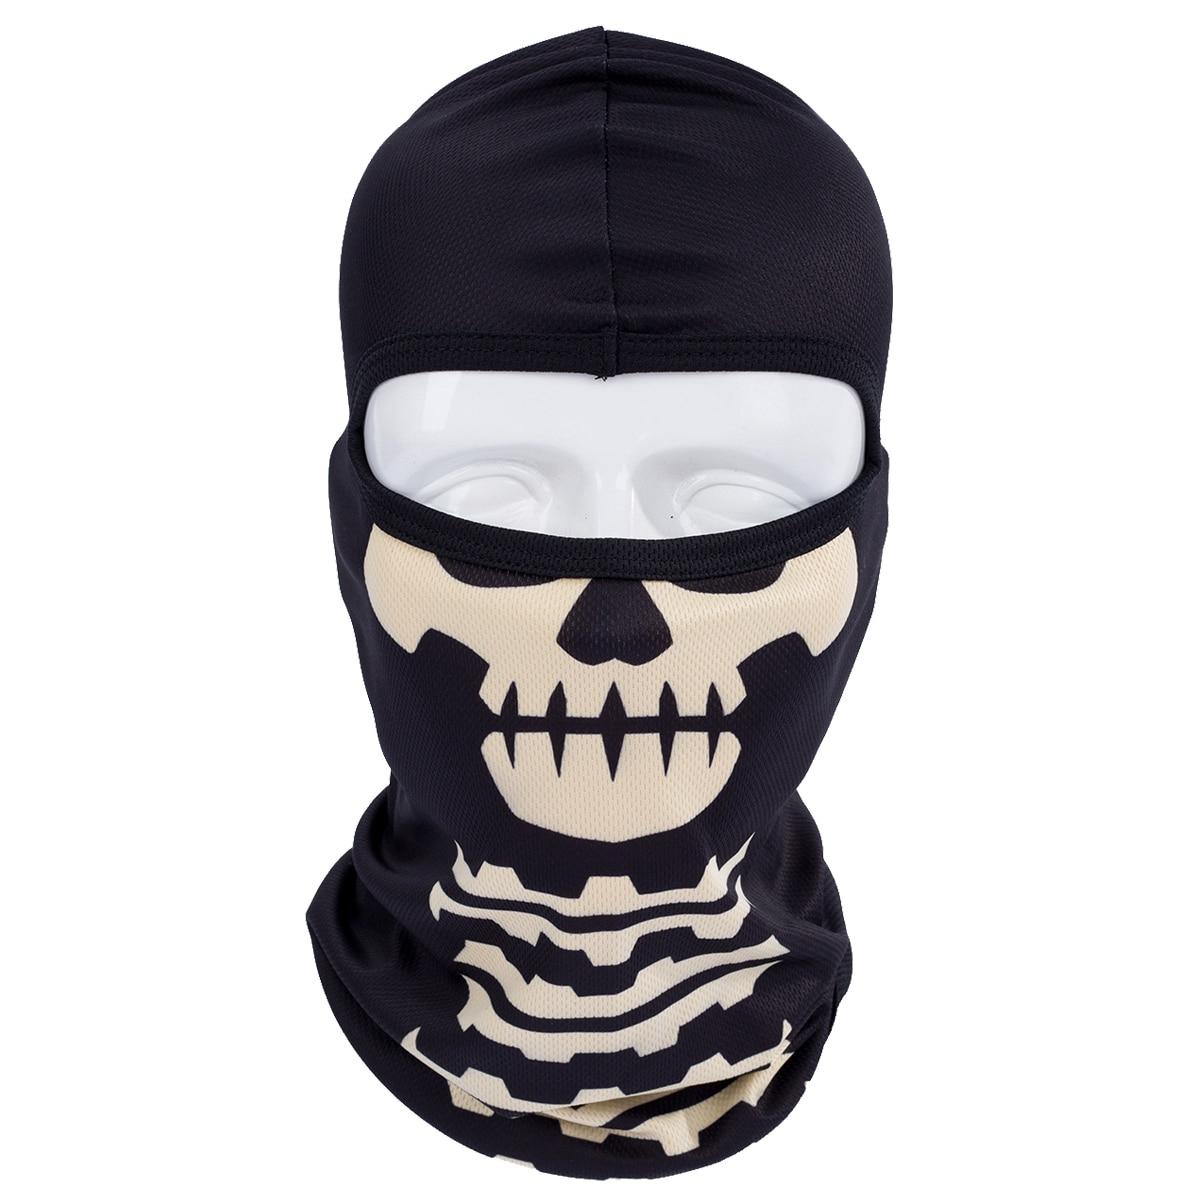 Online Get Cheap Ghost Balaclava Mask -Aliexpress.com | Alibaba Group